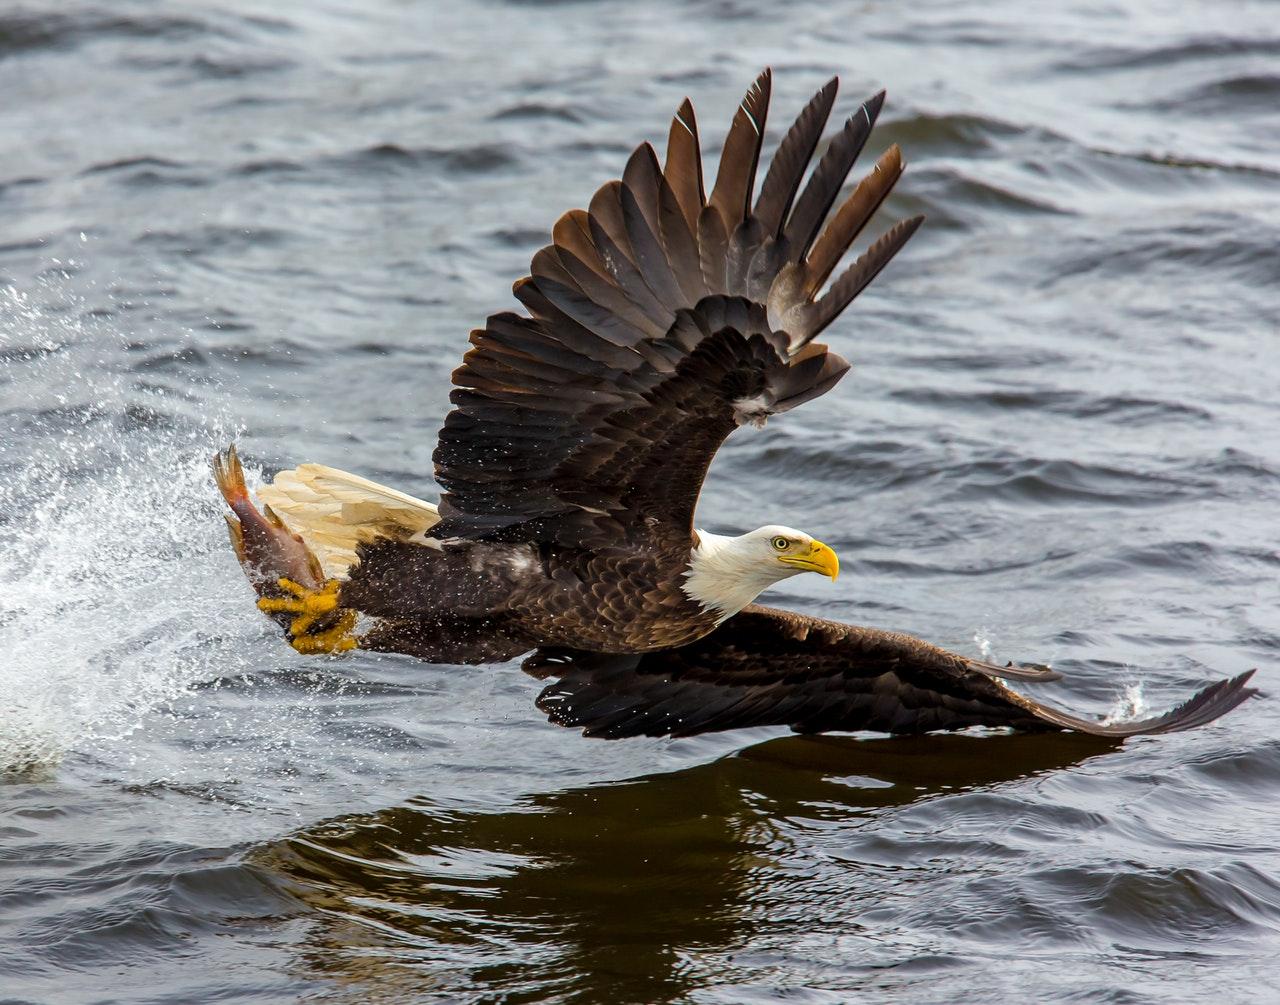 balt eagle atozmomm.com